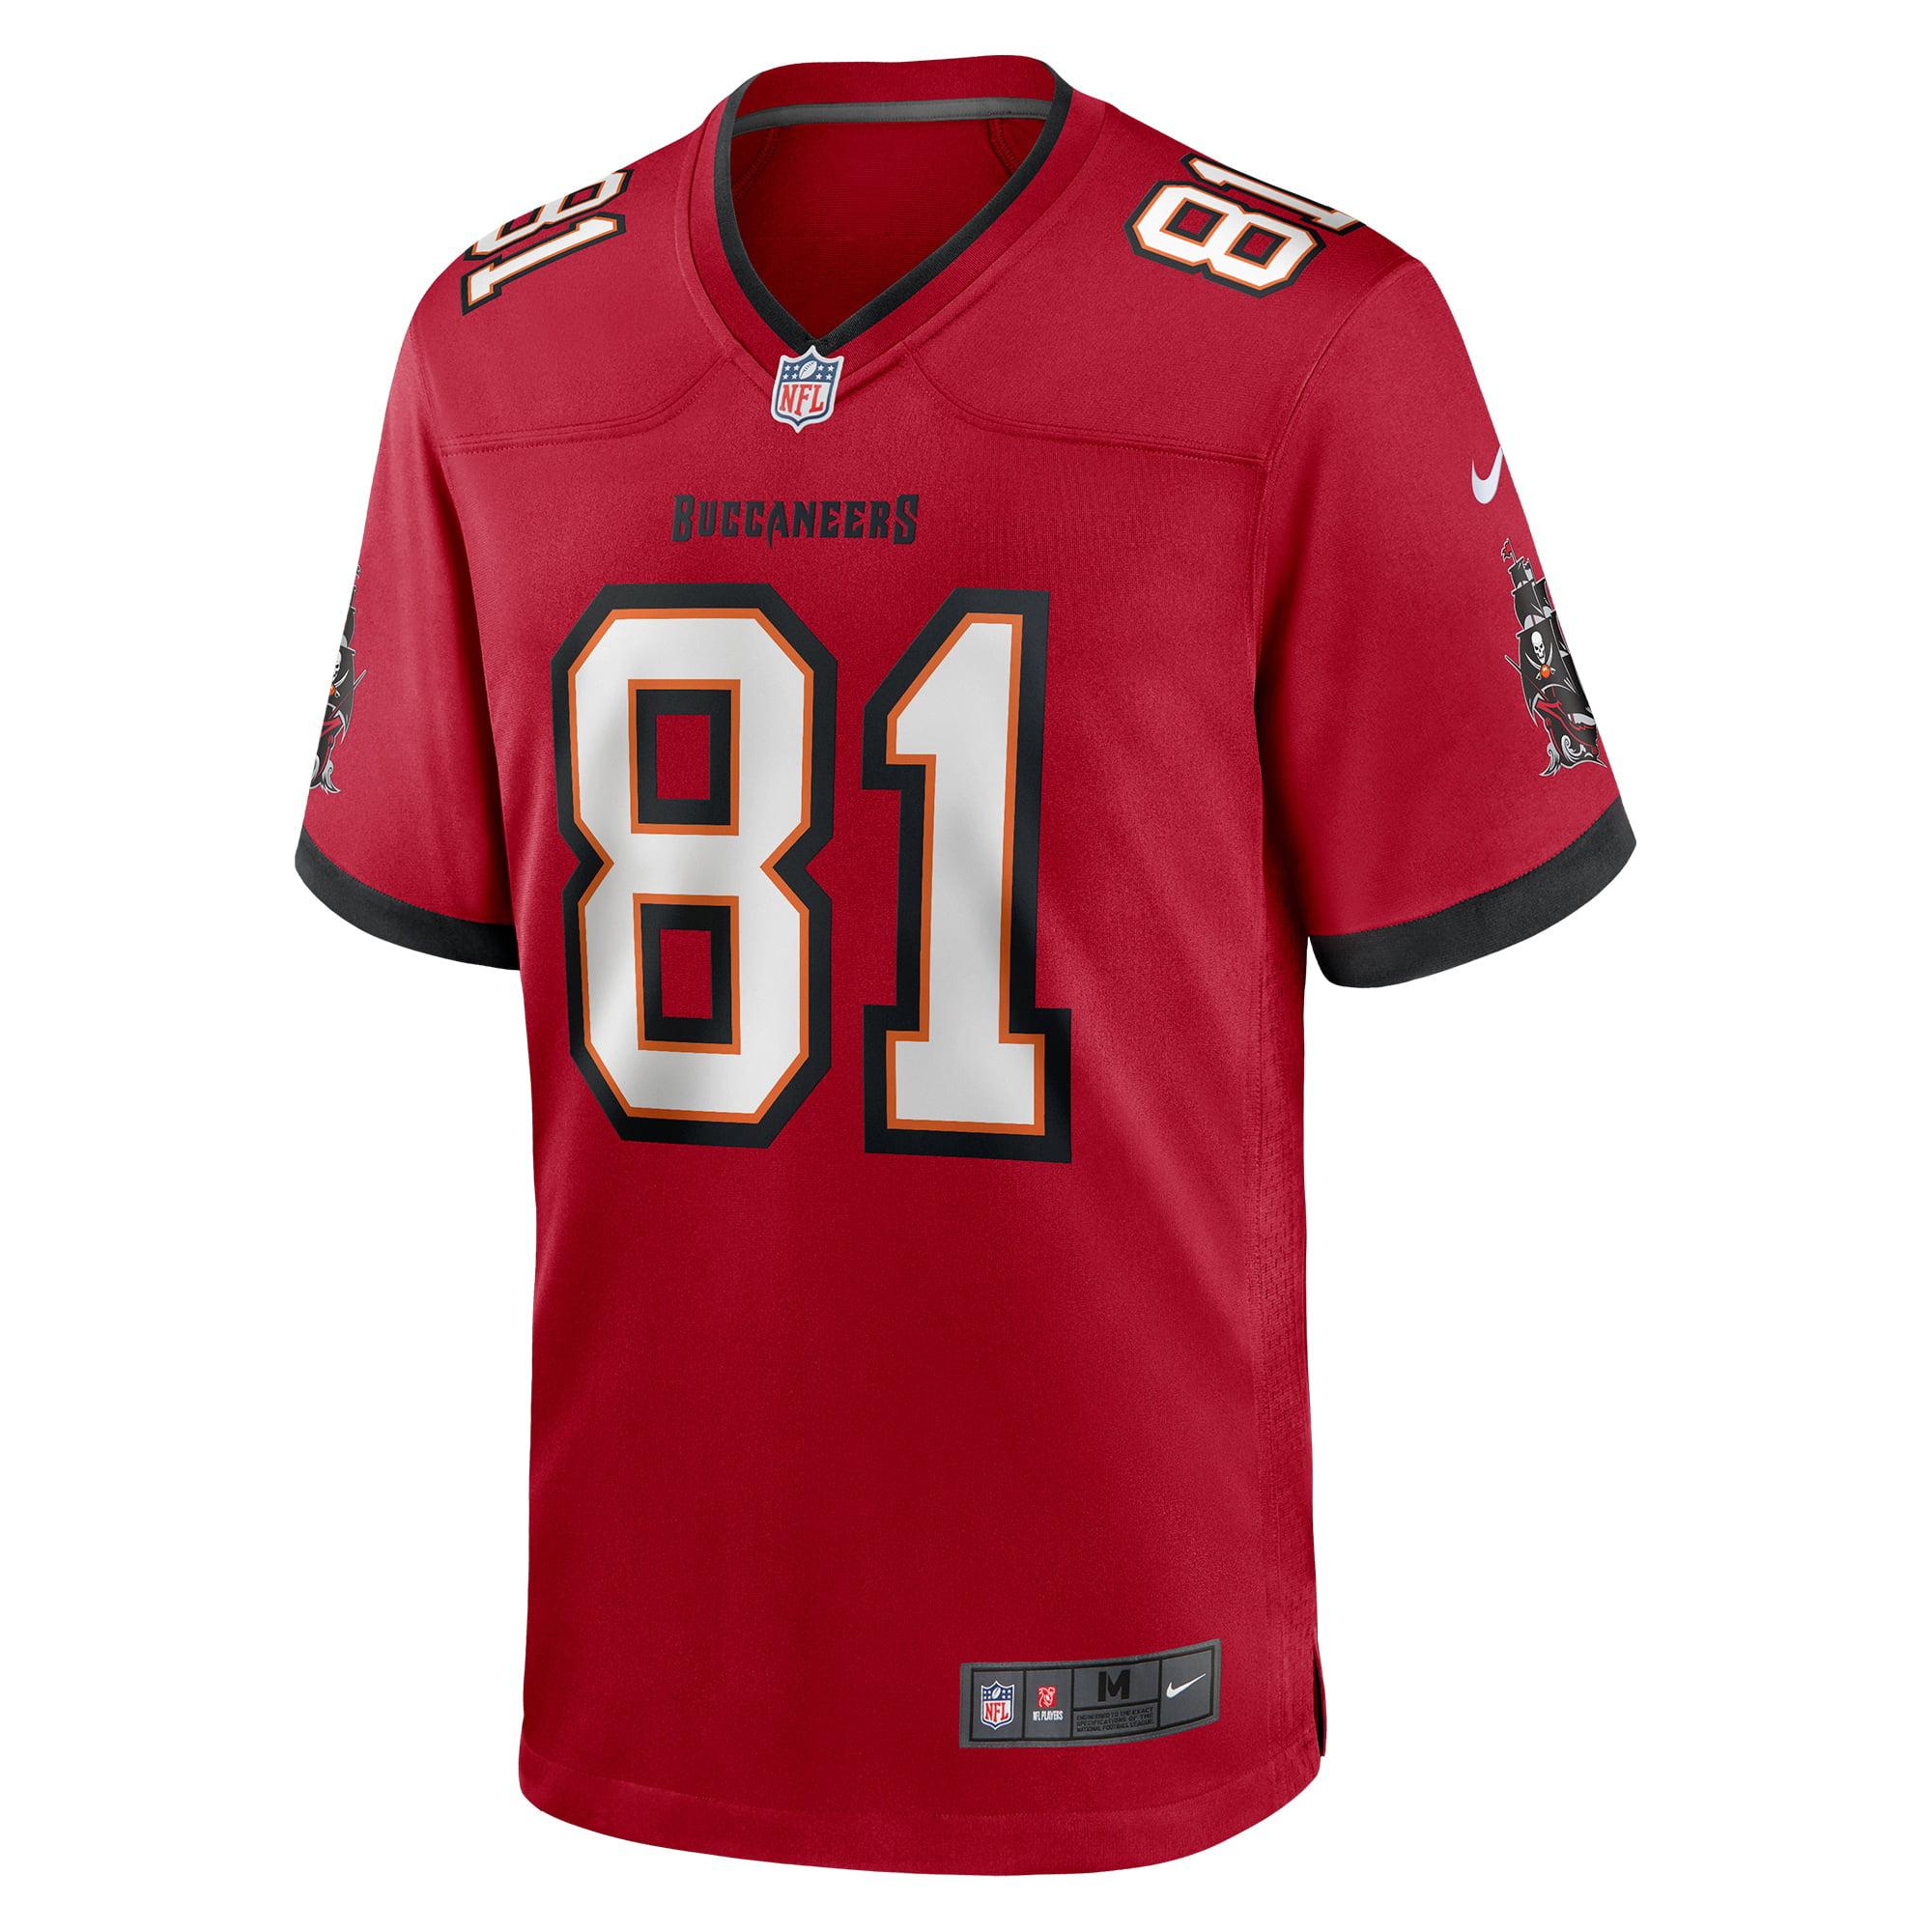 Antonio Brown Tampa Bay Buccaneers Nike Game Jersey - Red